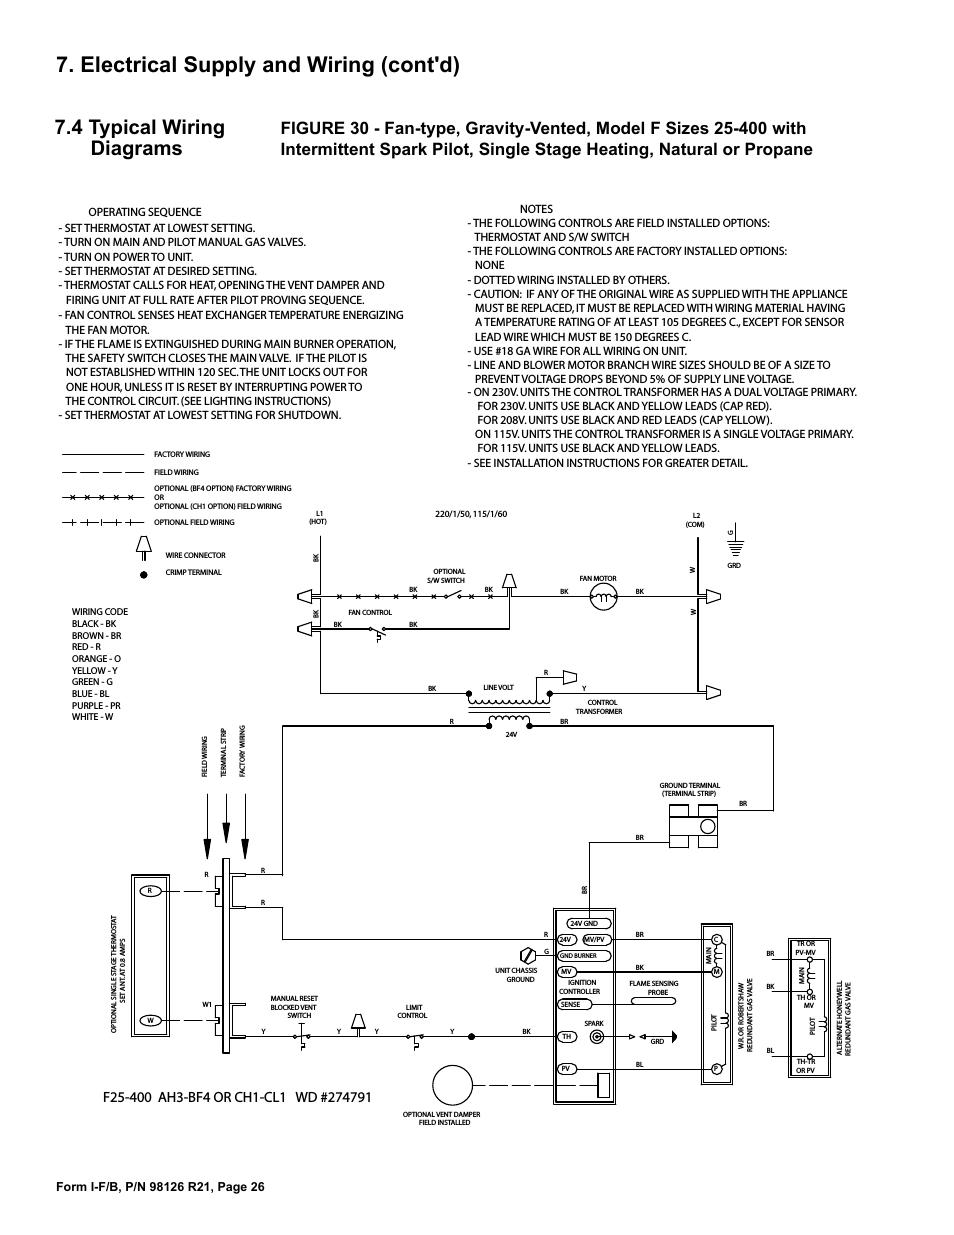 hight resolution of reznor heater wiring diagram collection reznor wiring diagram reznor xl wiring diagram reznor heater wiring